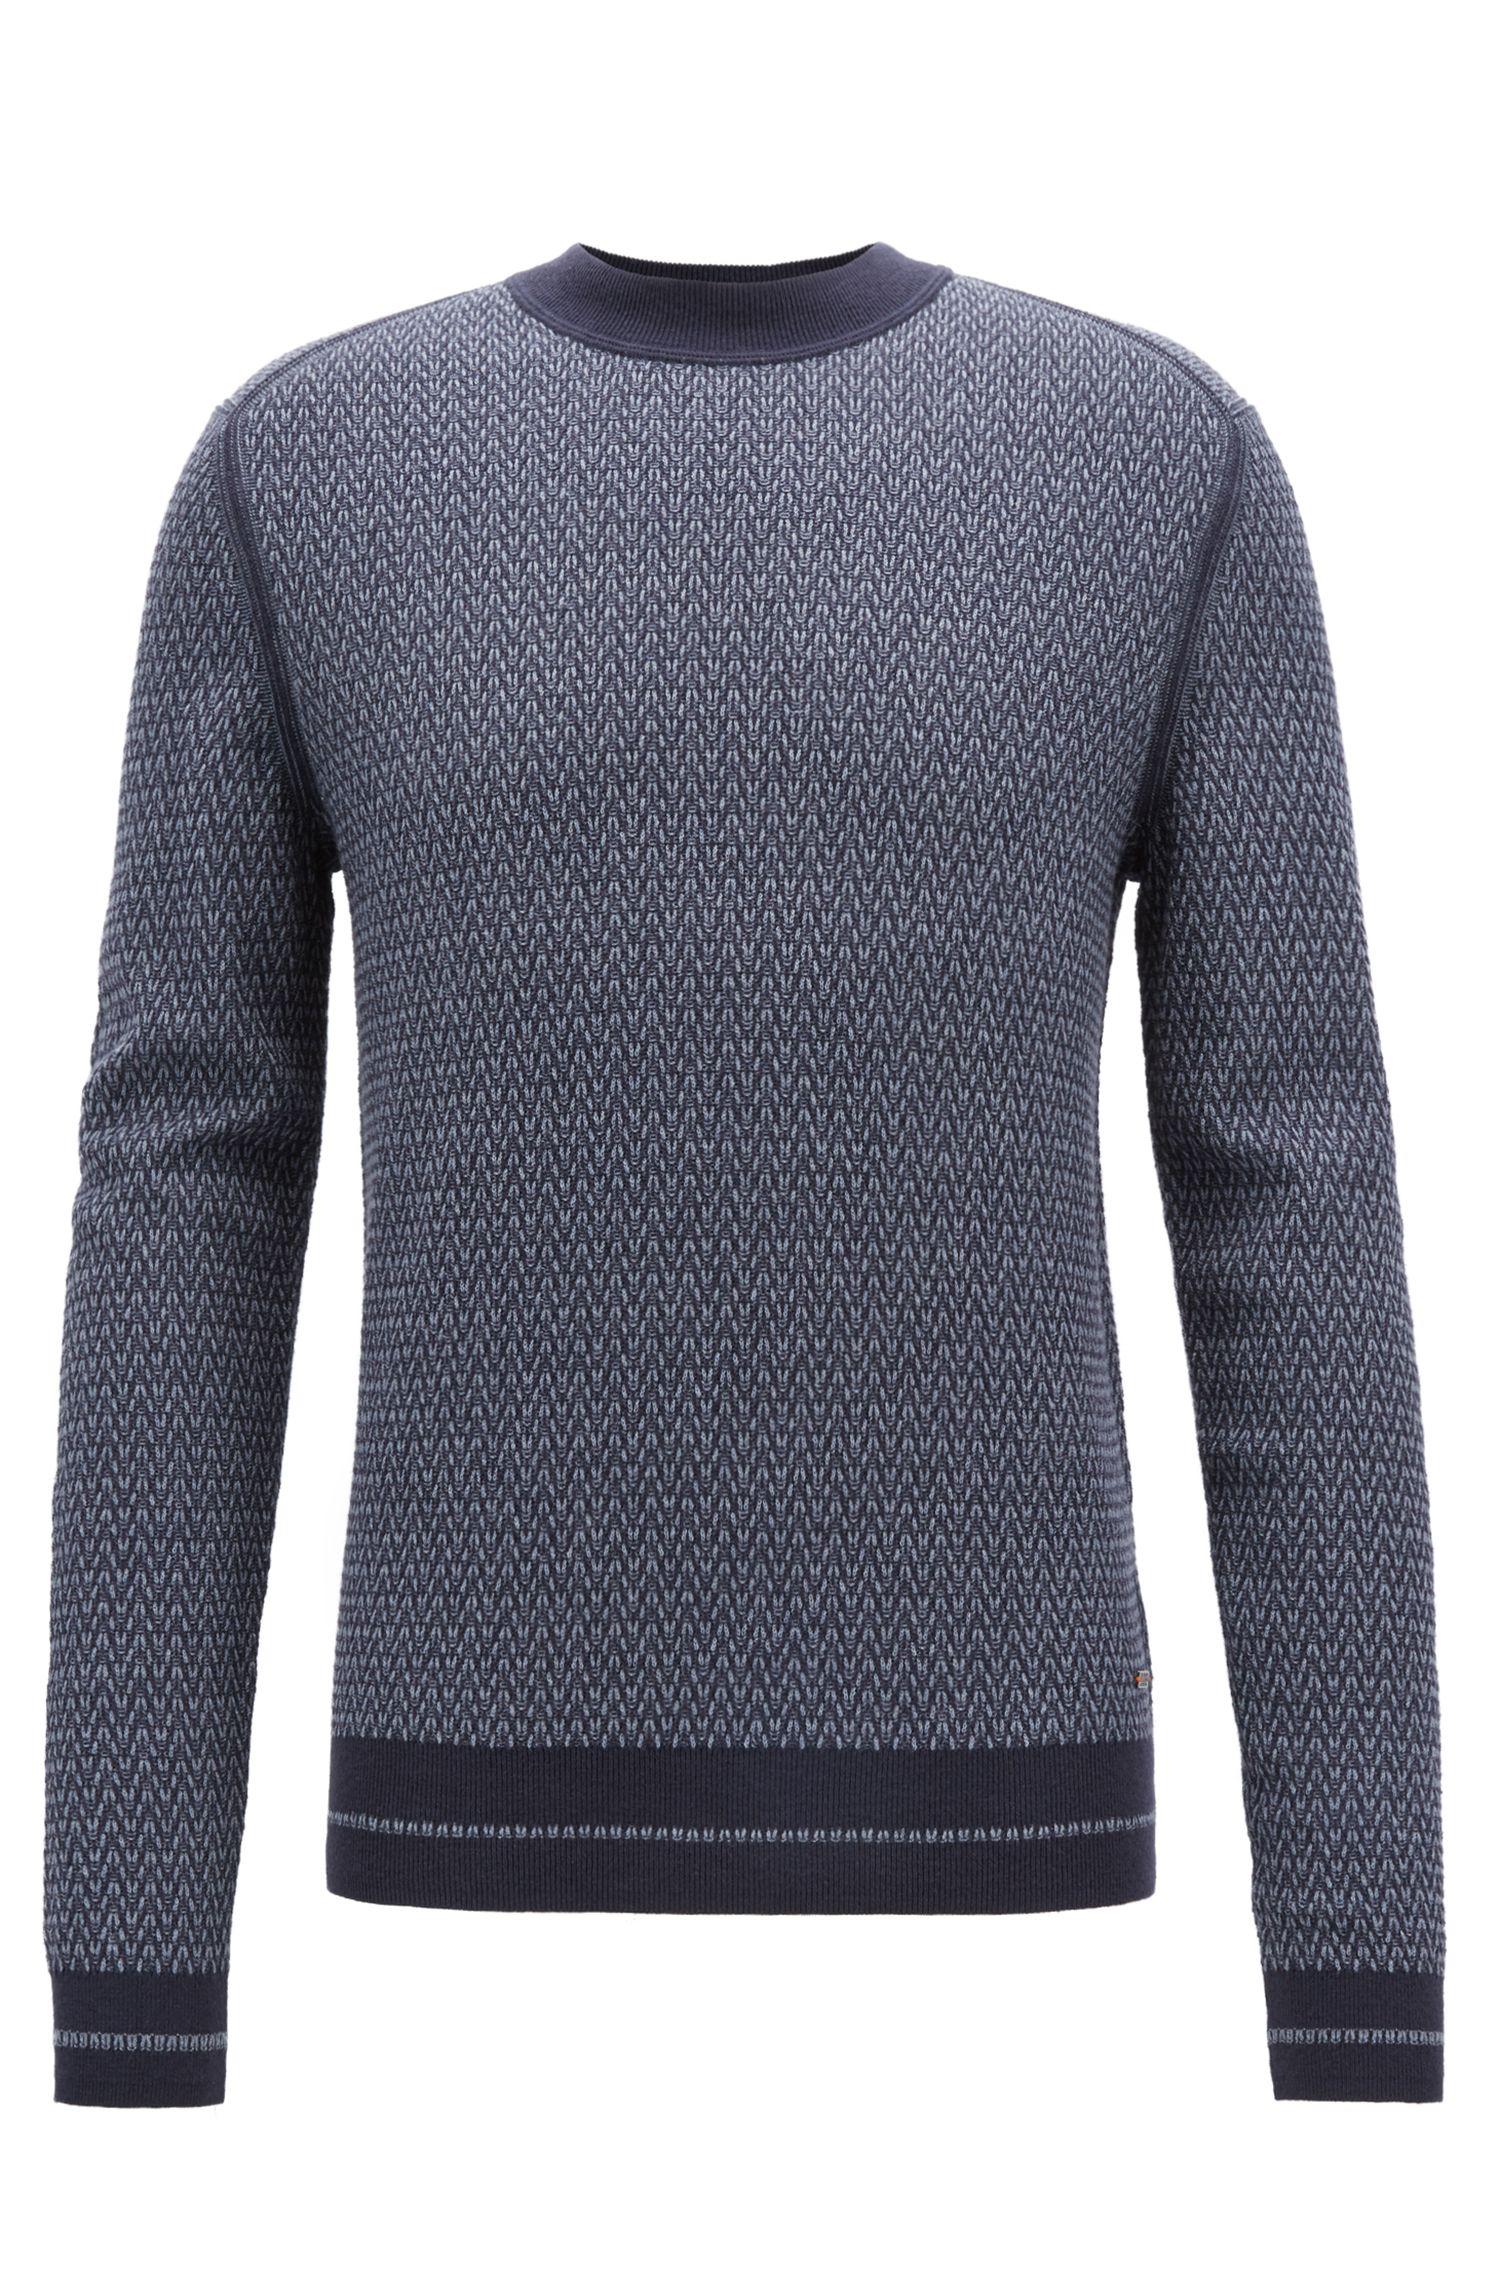 Crew-neck sweater in a micro-structured cotton blend, Dark Blue